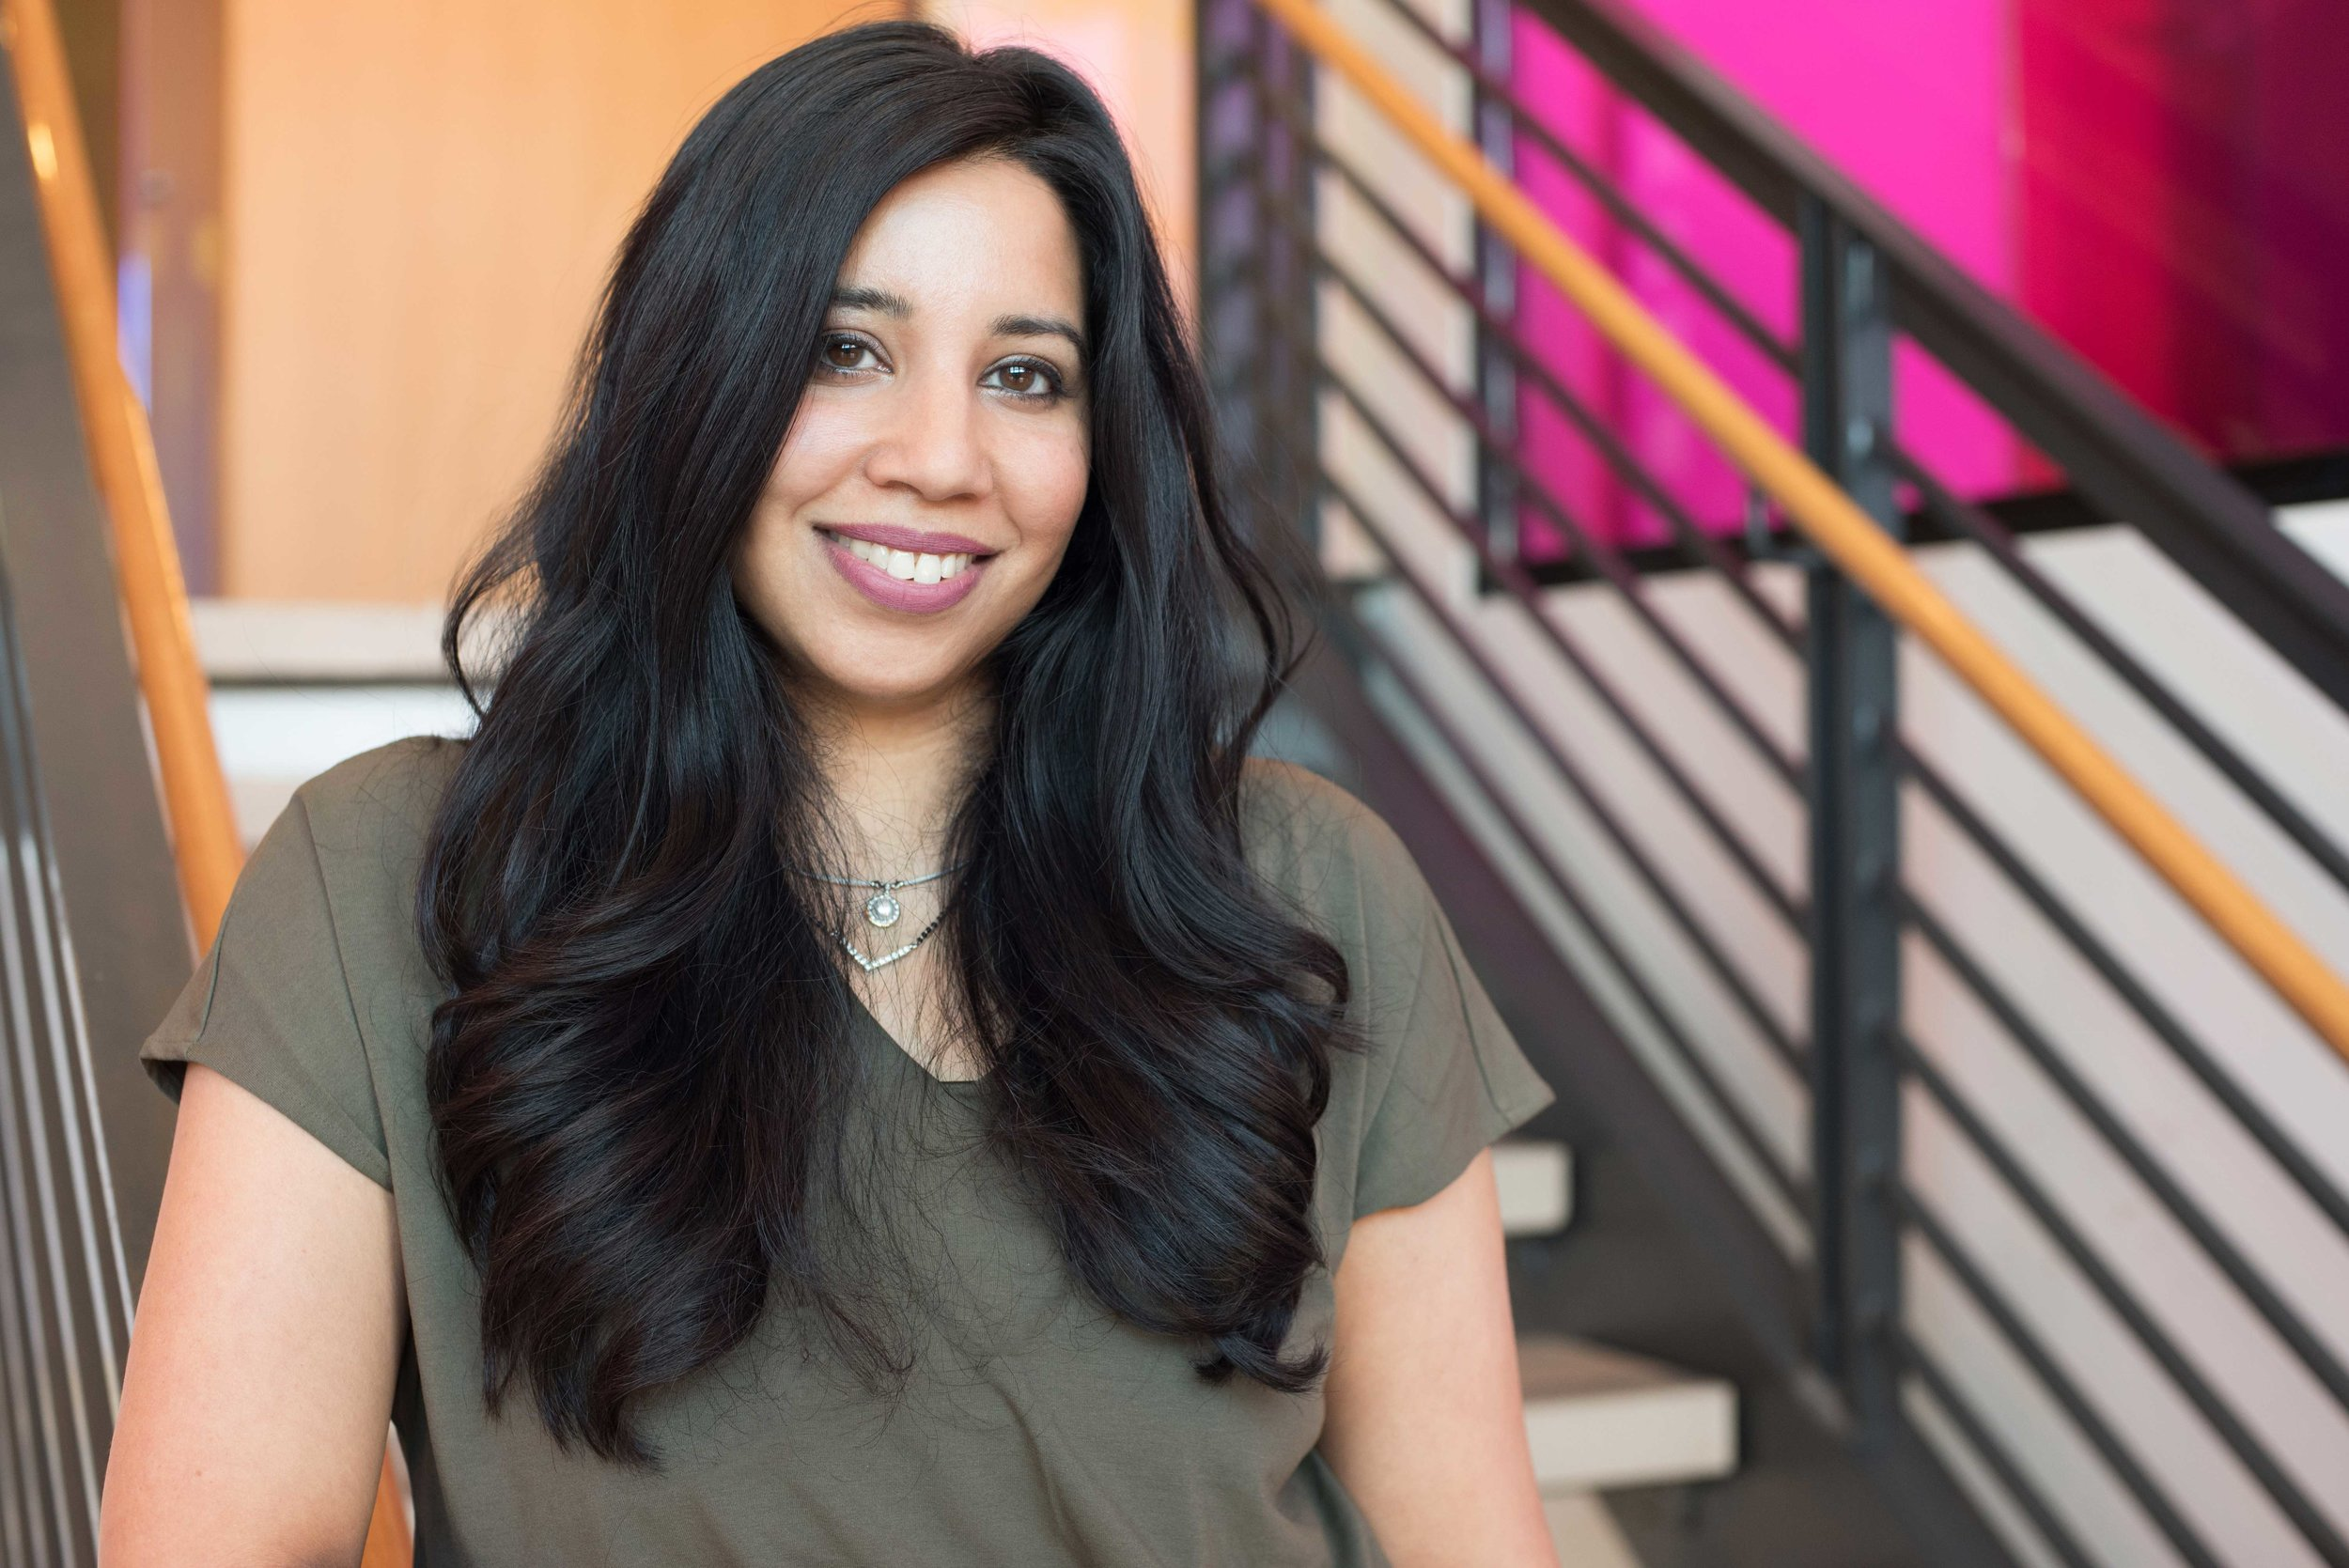 Swati Vauthrin   Director of Engineering, Buzzfeed, New York City